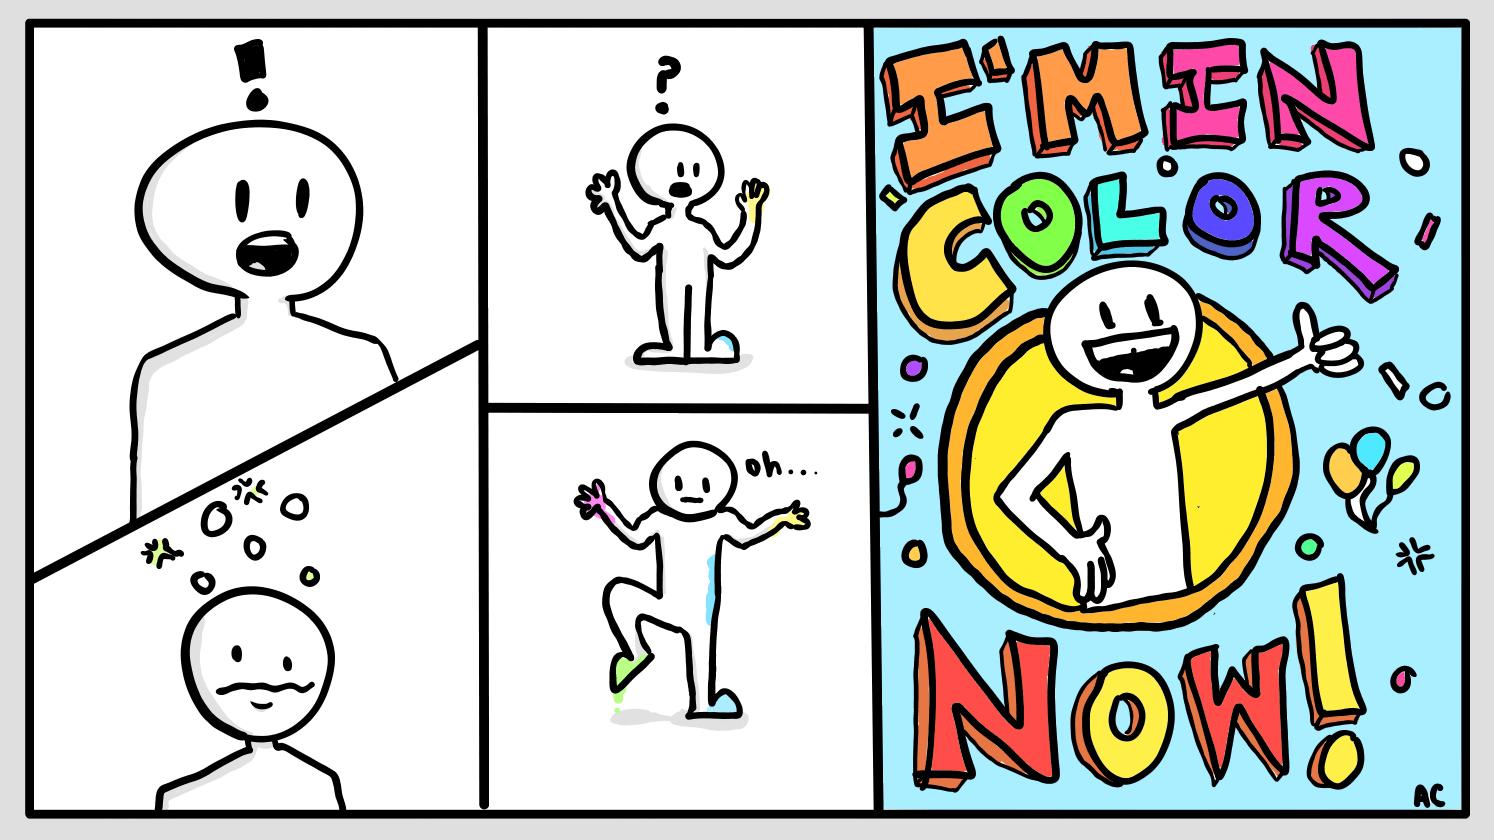 colorcartoon